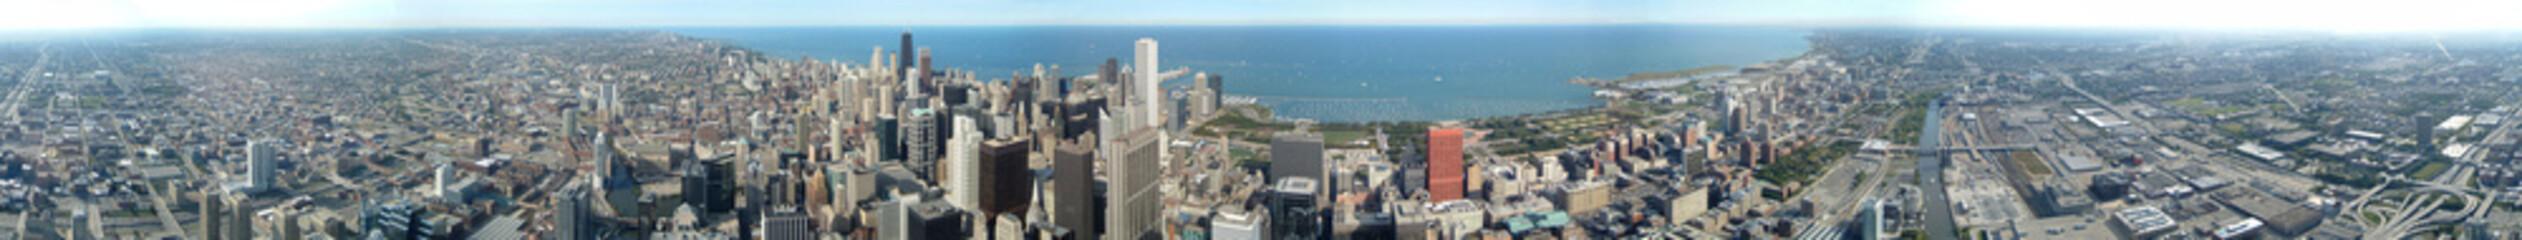 panoramique 360° de Chicago